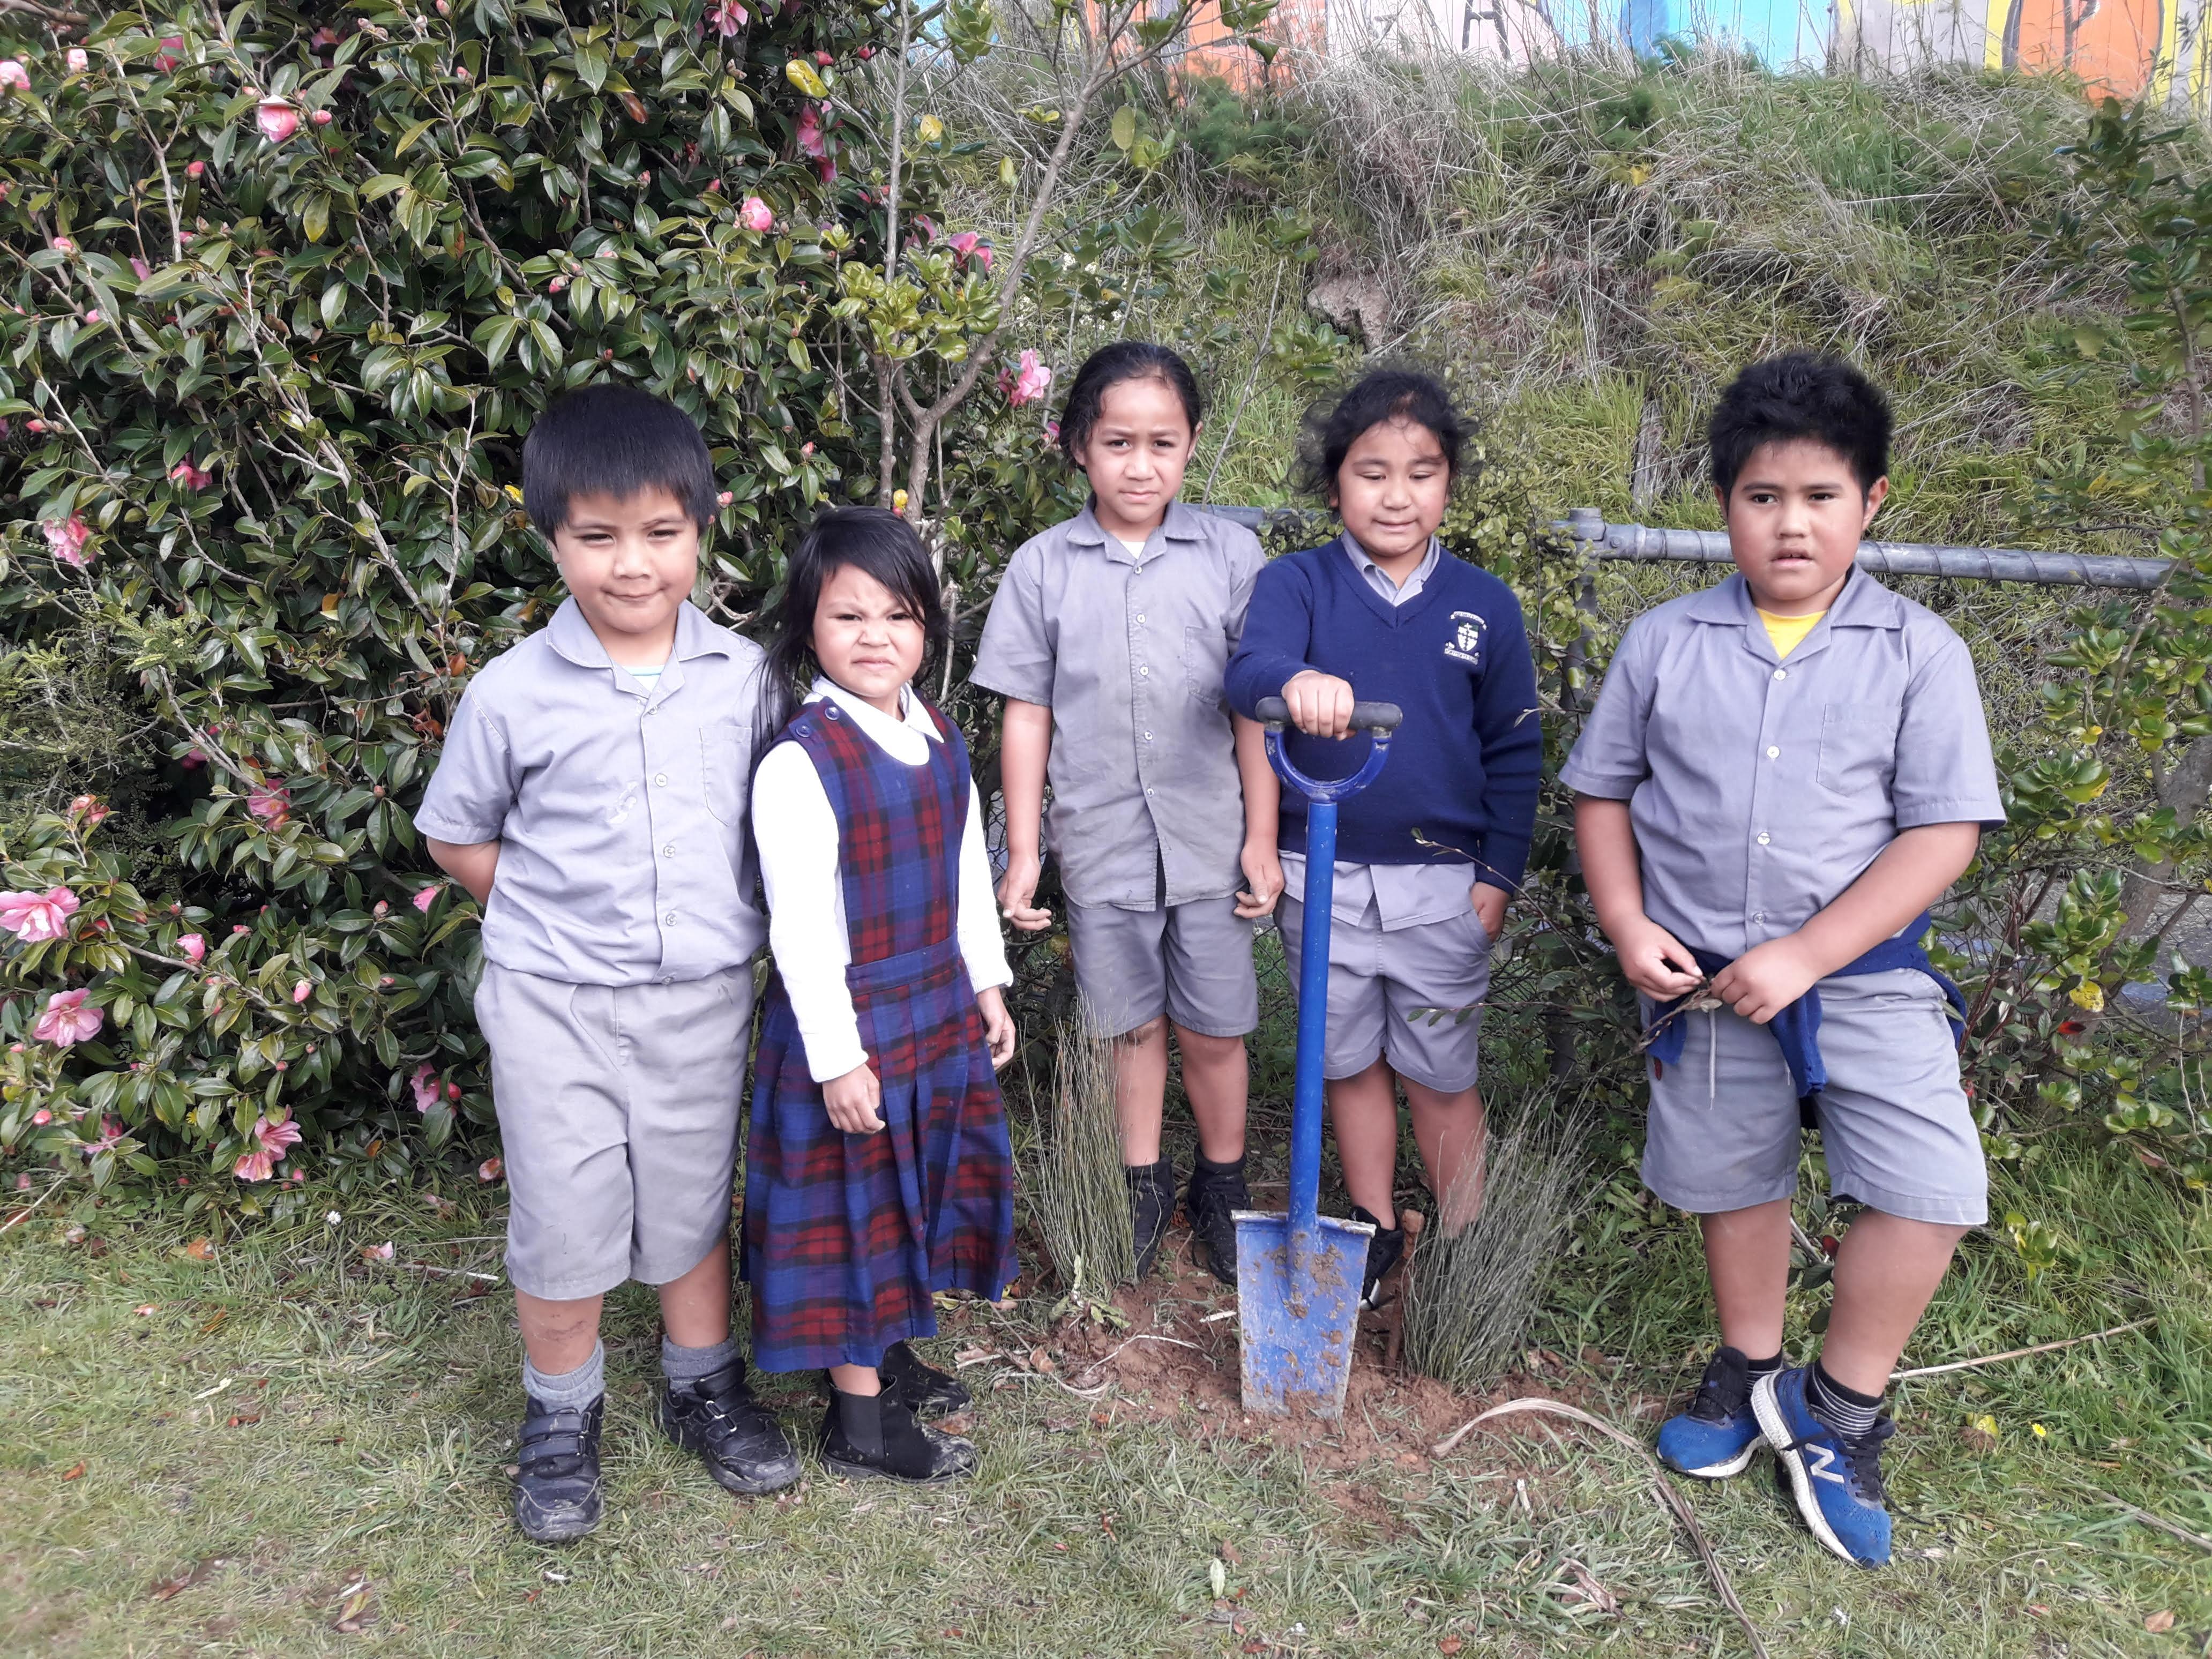 Holy Family School - Porirua 1 (2020)